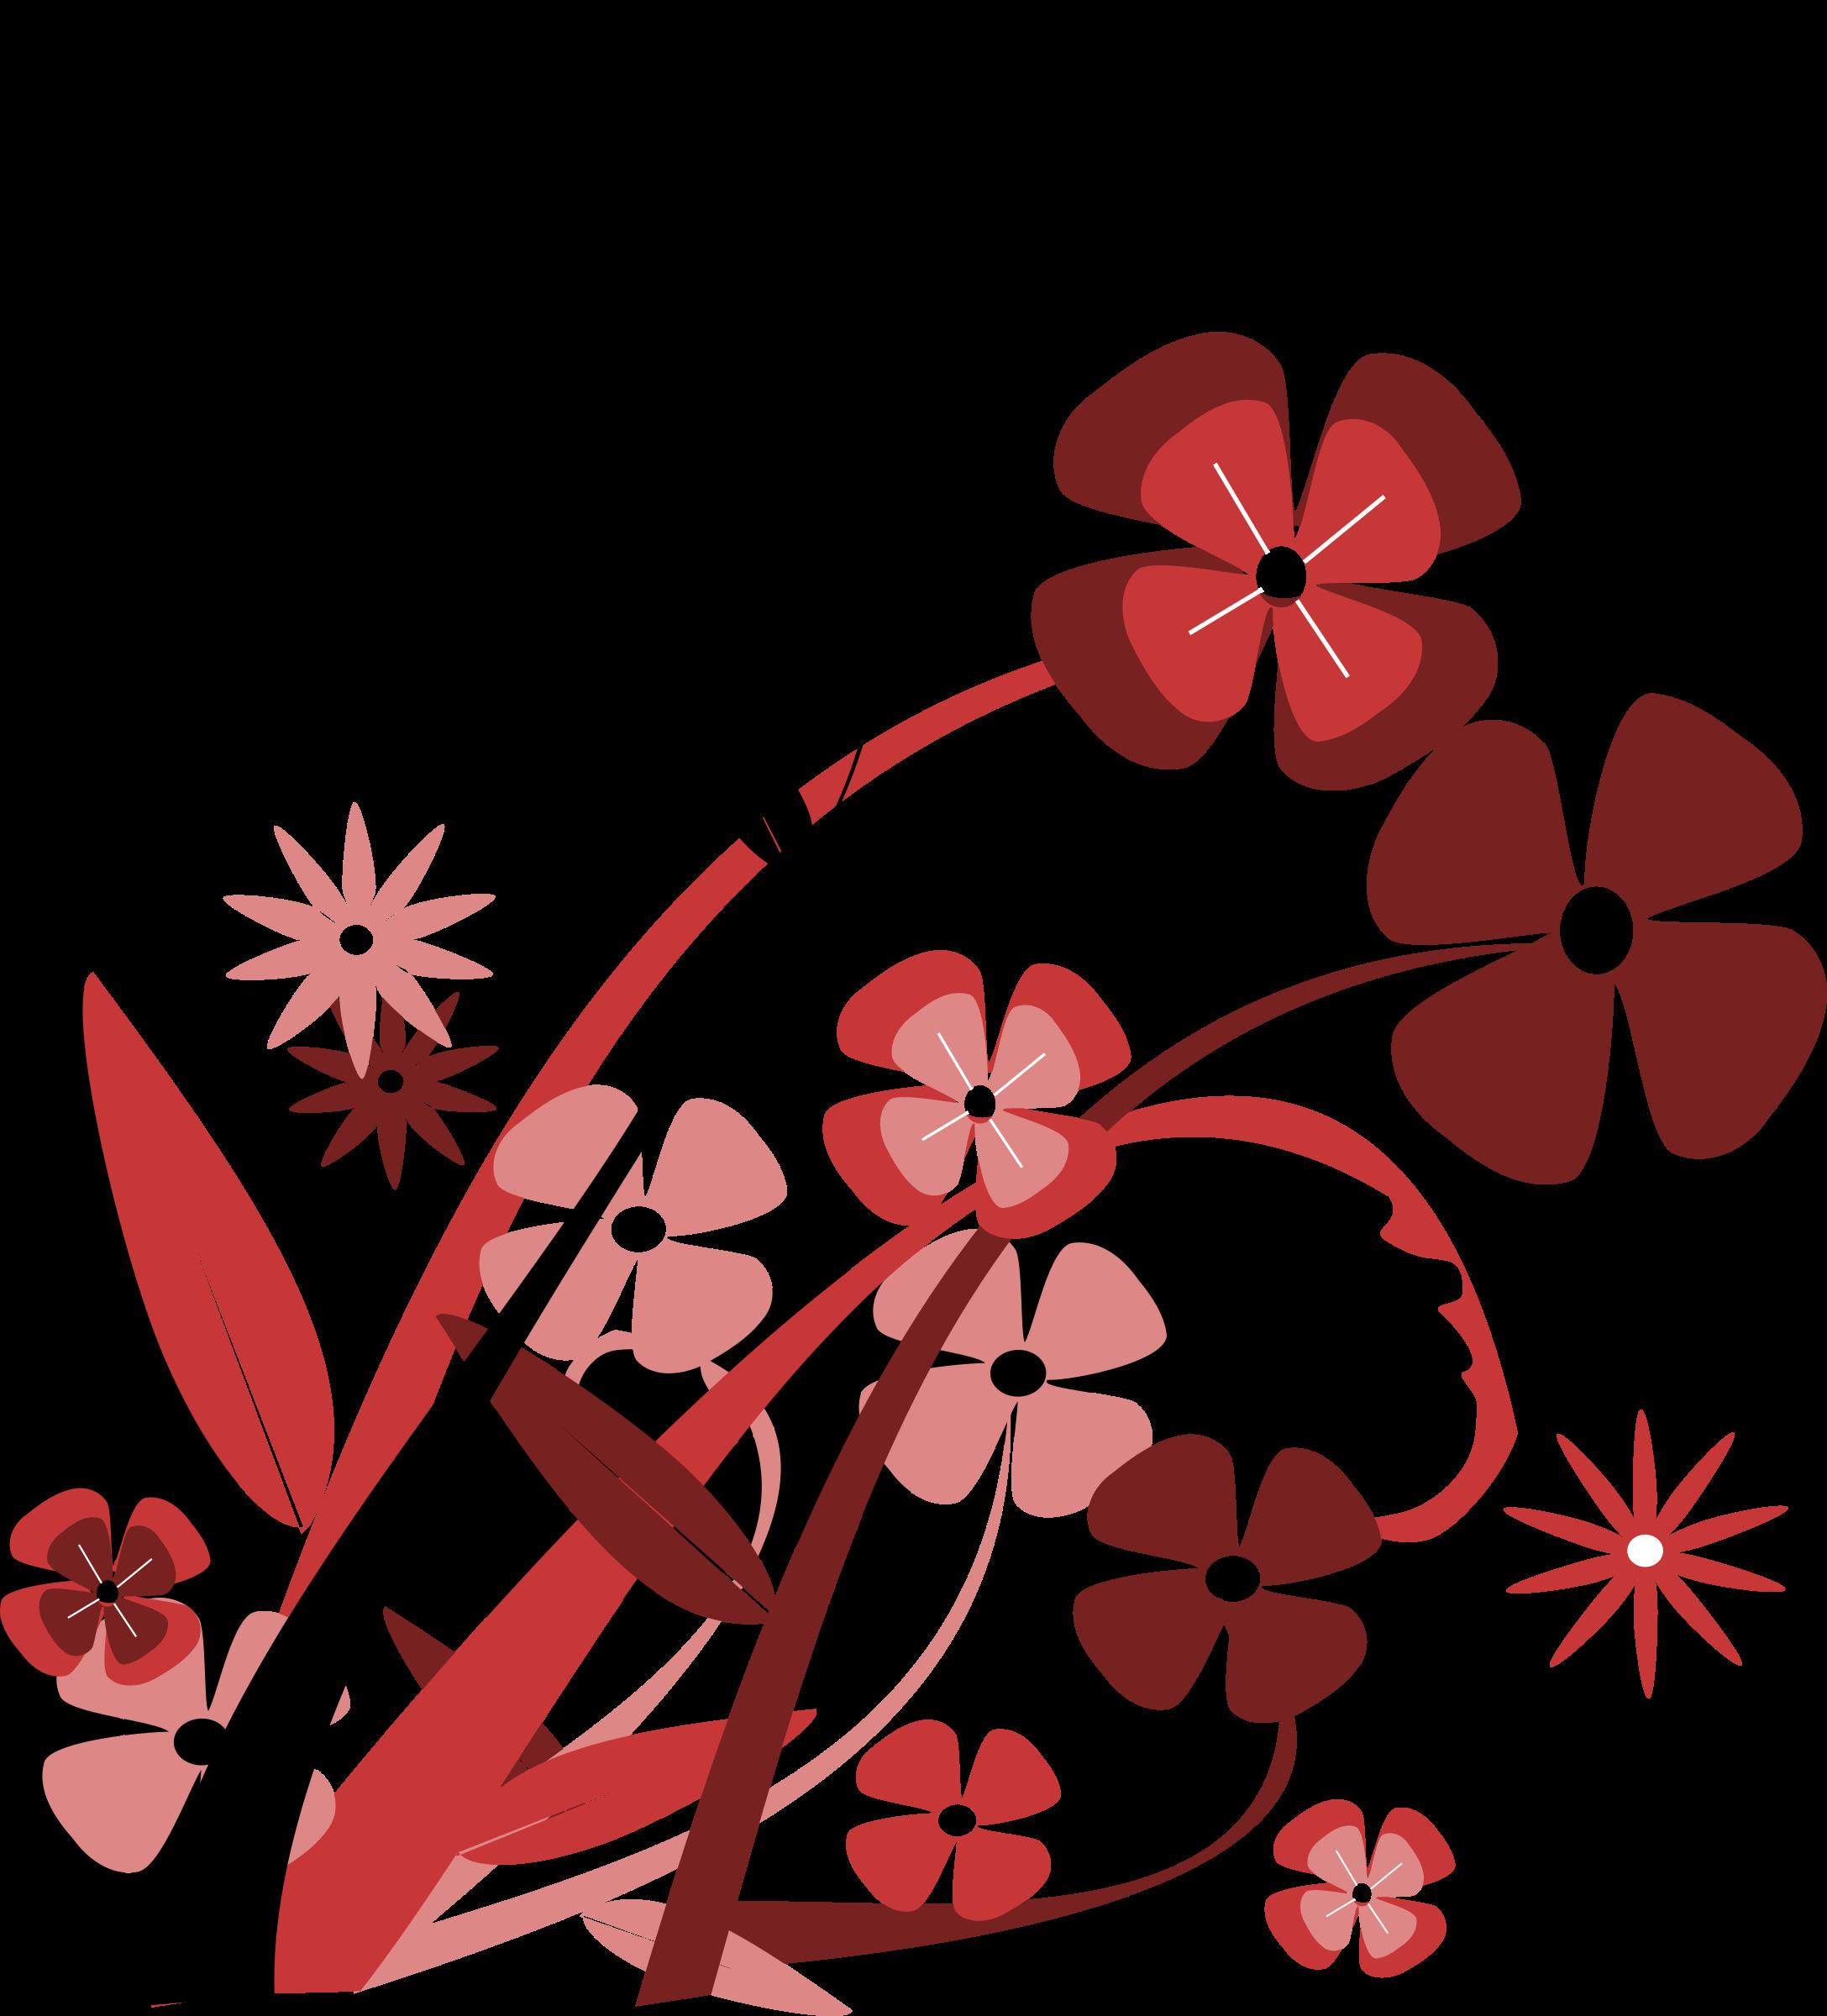 Flower spring big image. Planting clipart kid